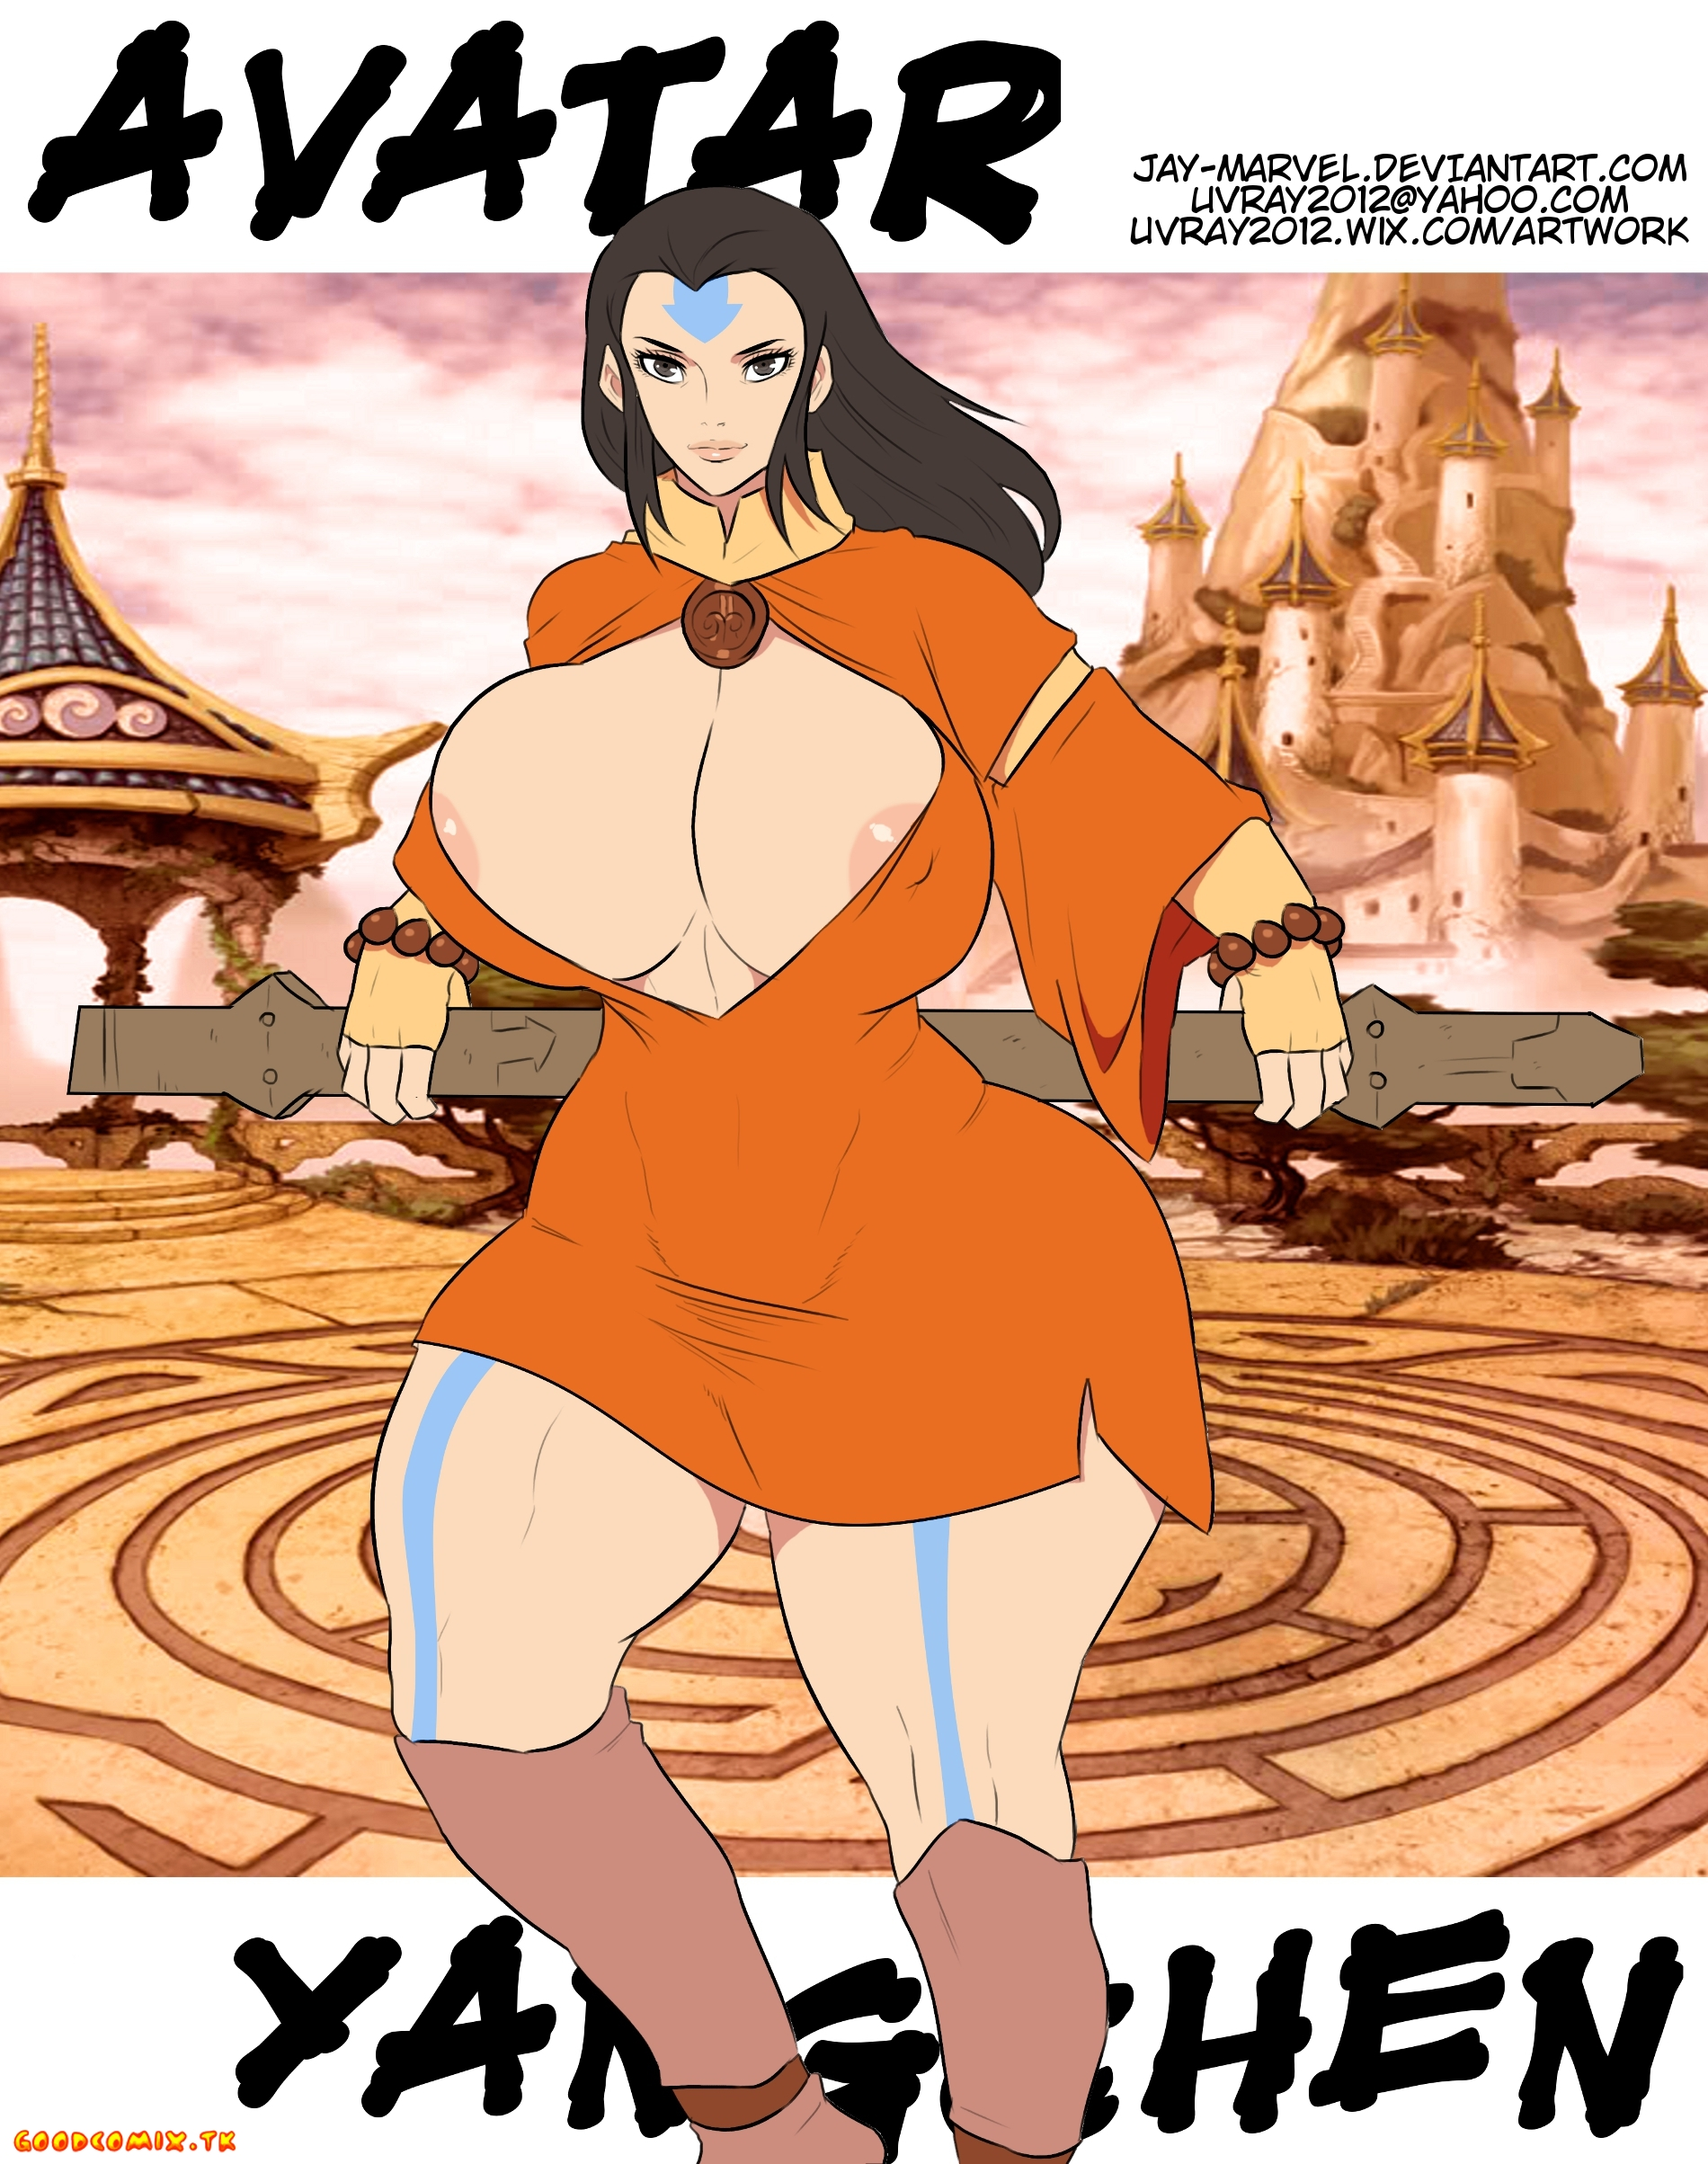 Goodcomix.tk Avatar the Last Airbender - [Jay Marvel] - Avatar Yangchen